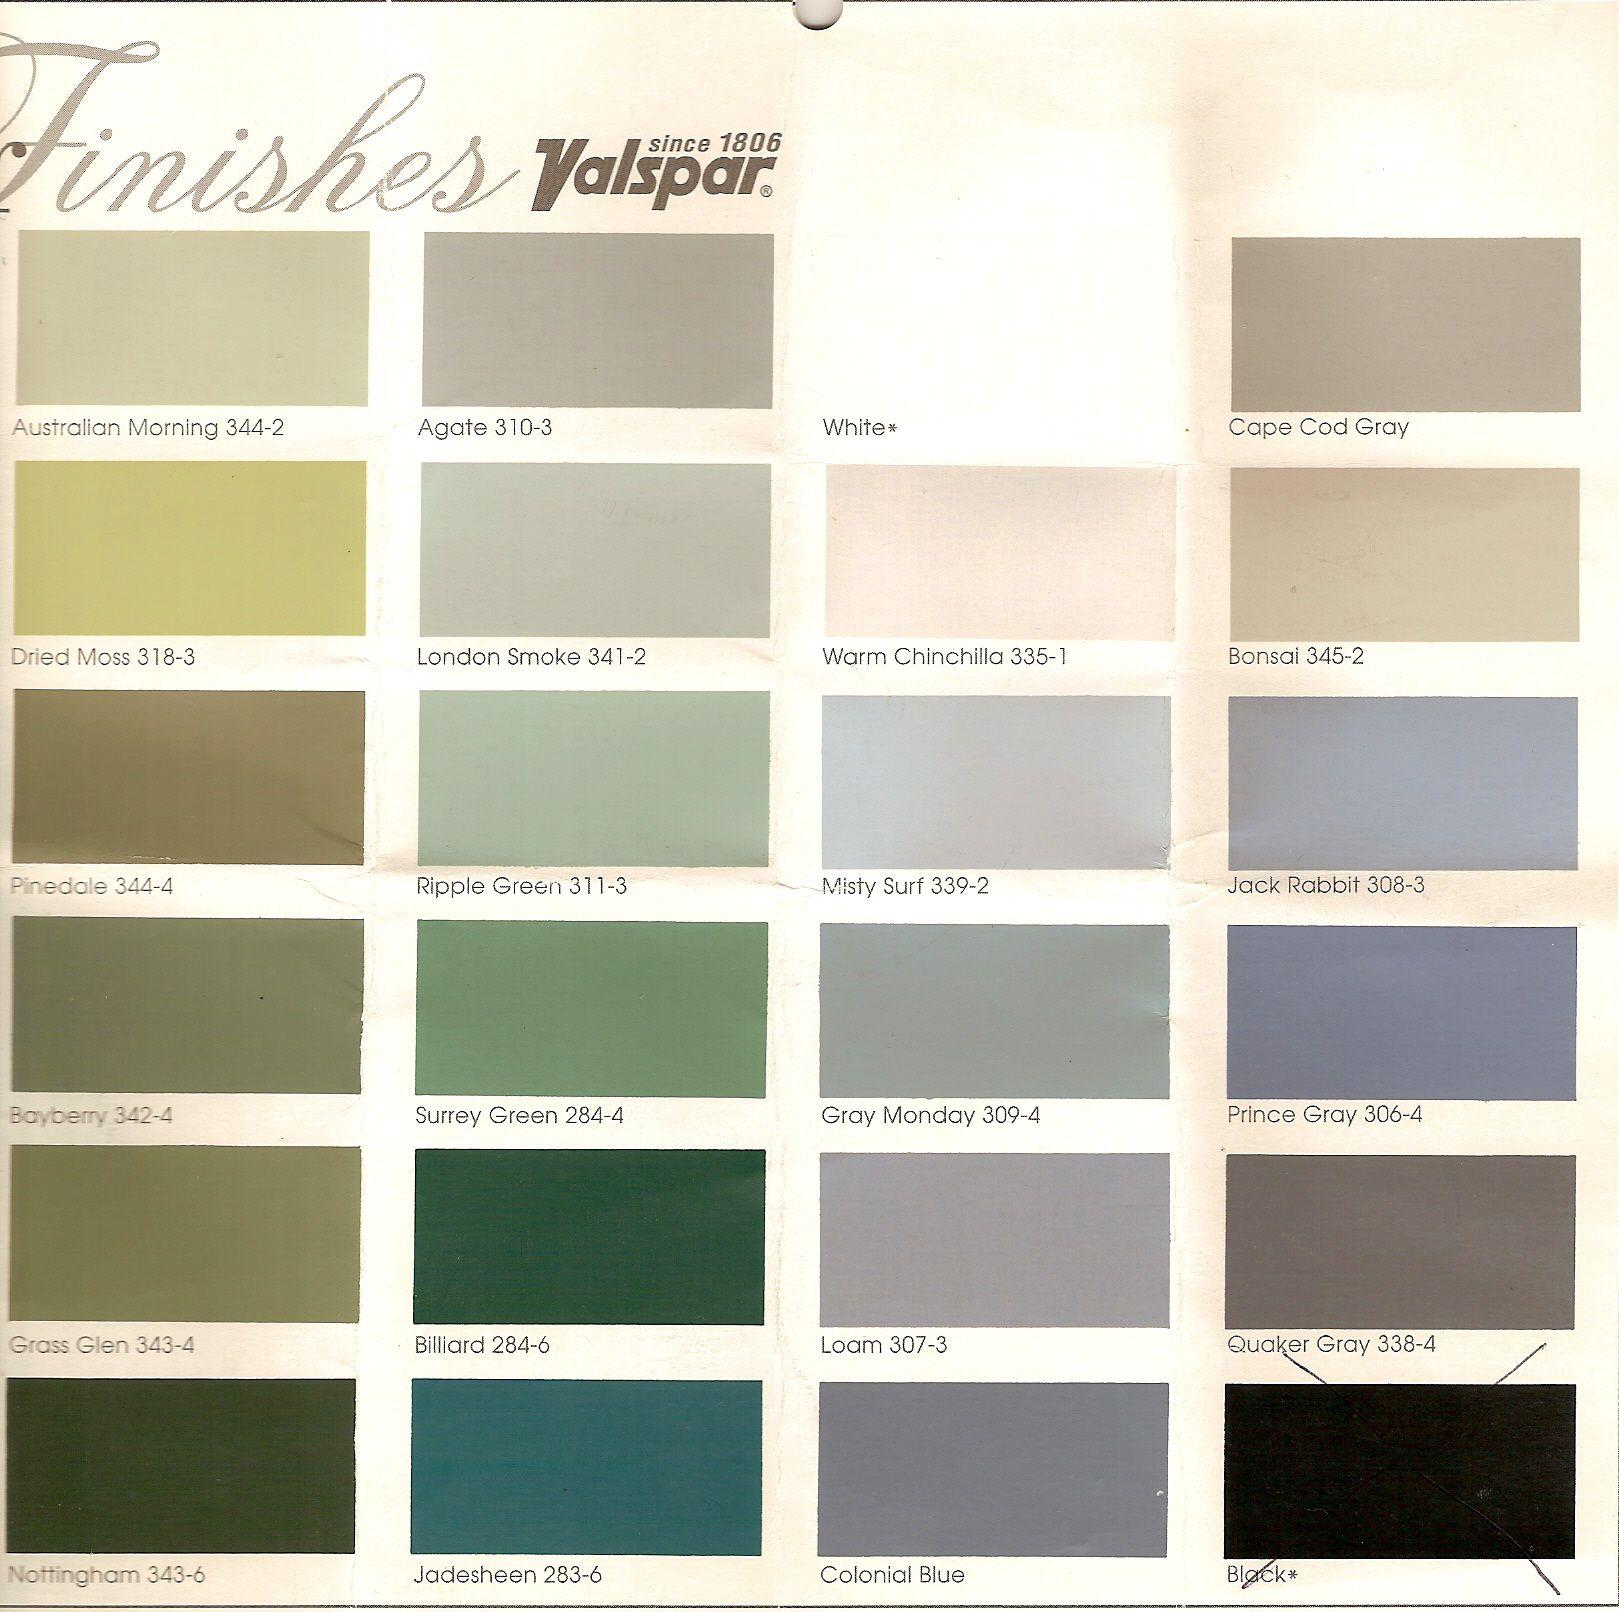 Victorian Paint Colors 16 ideas of victorian interior design | 1930s house, paint color